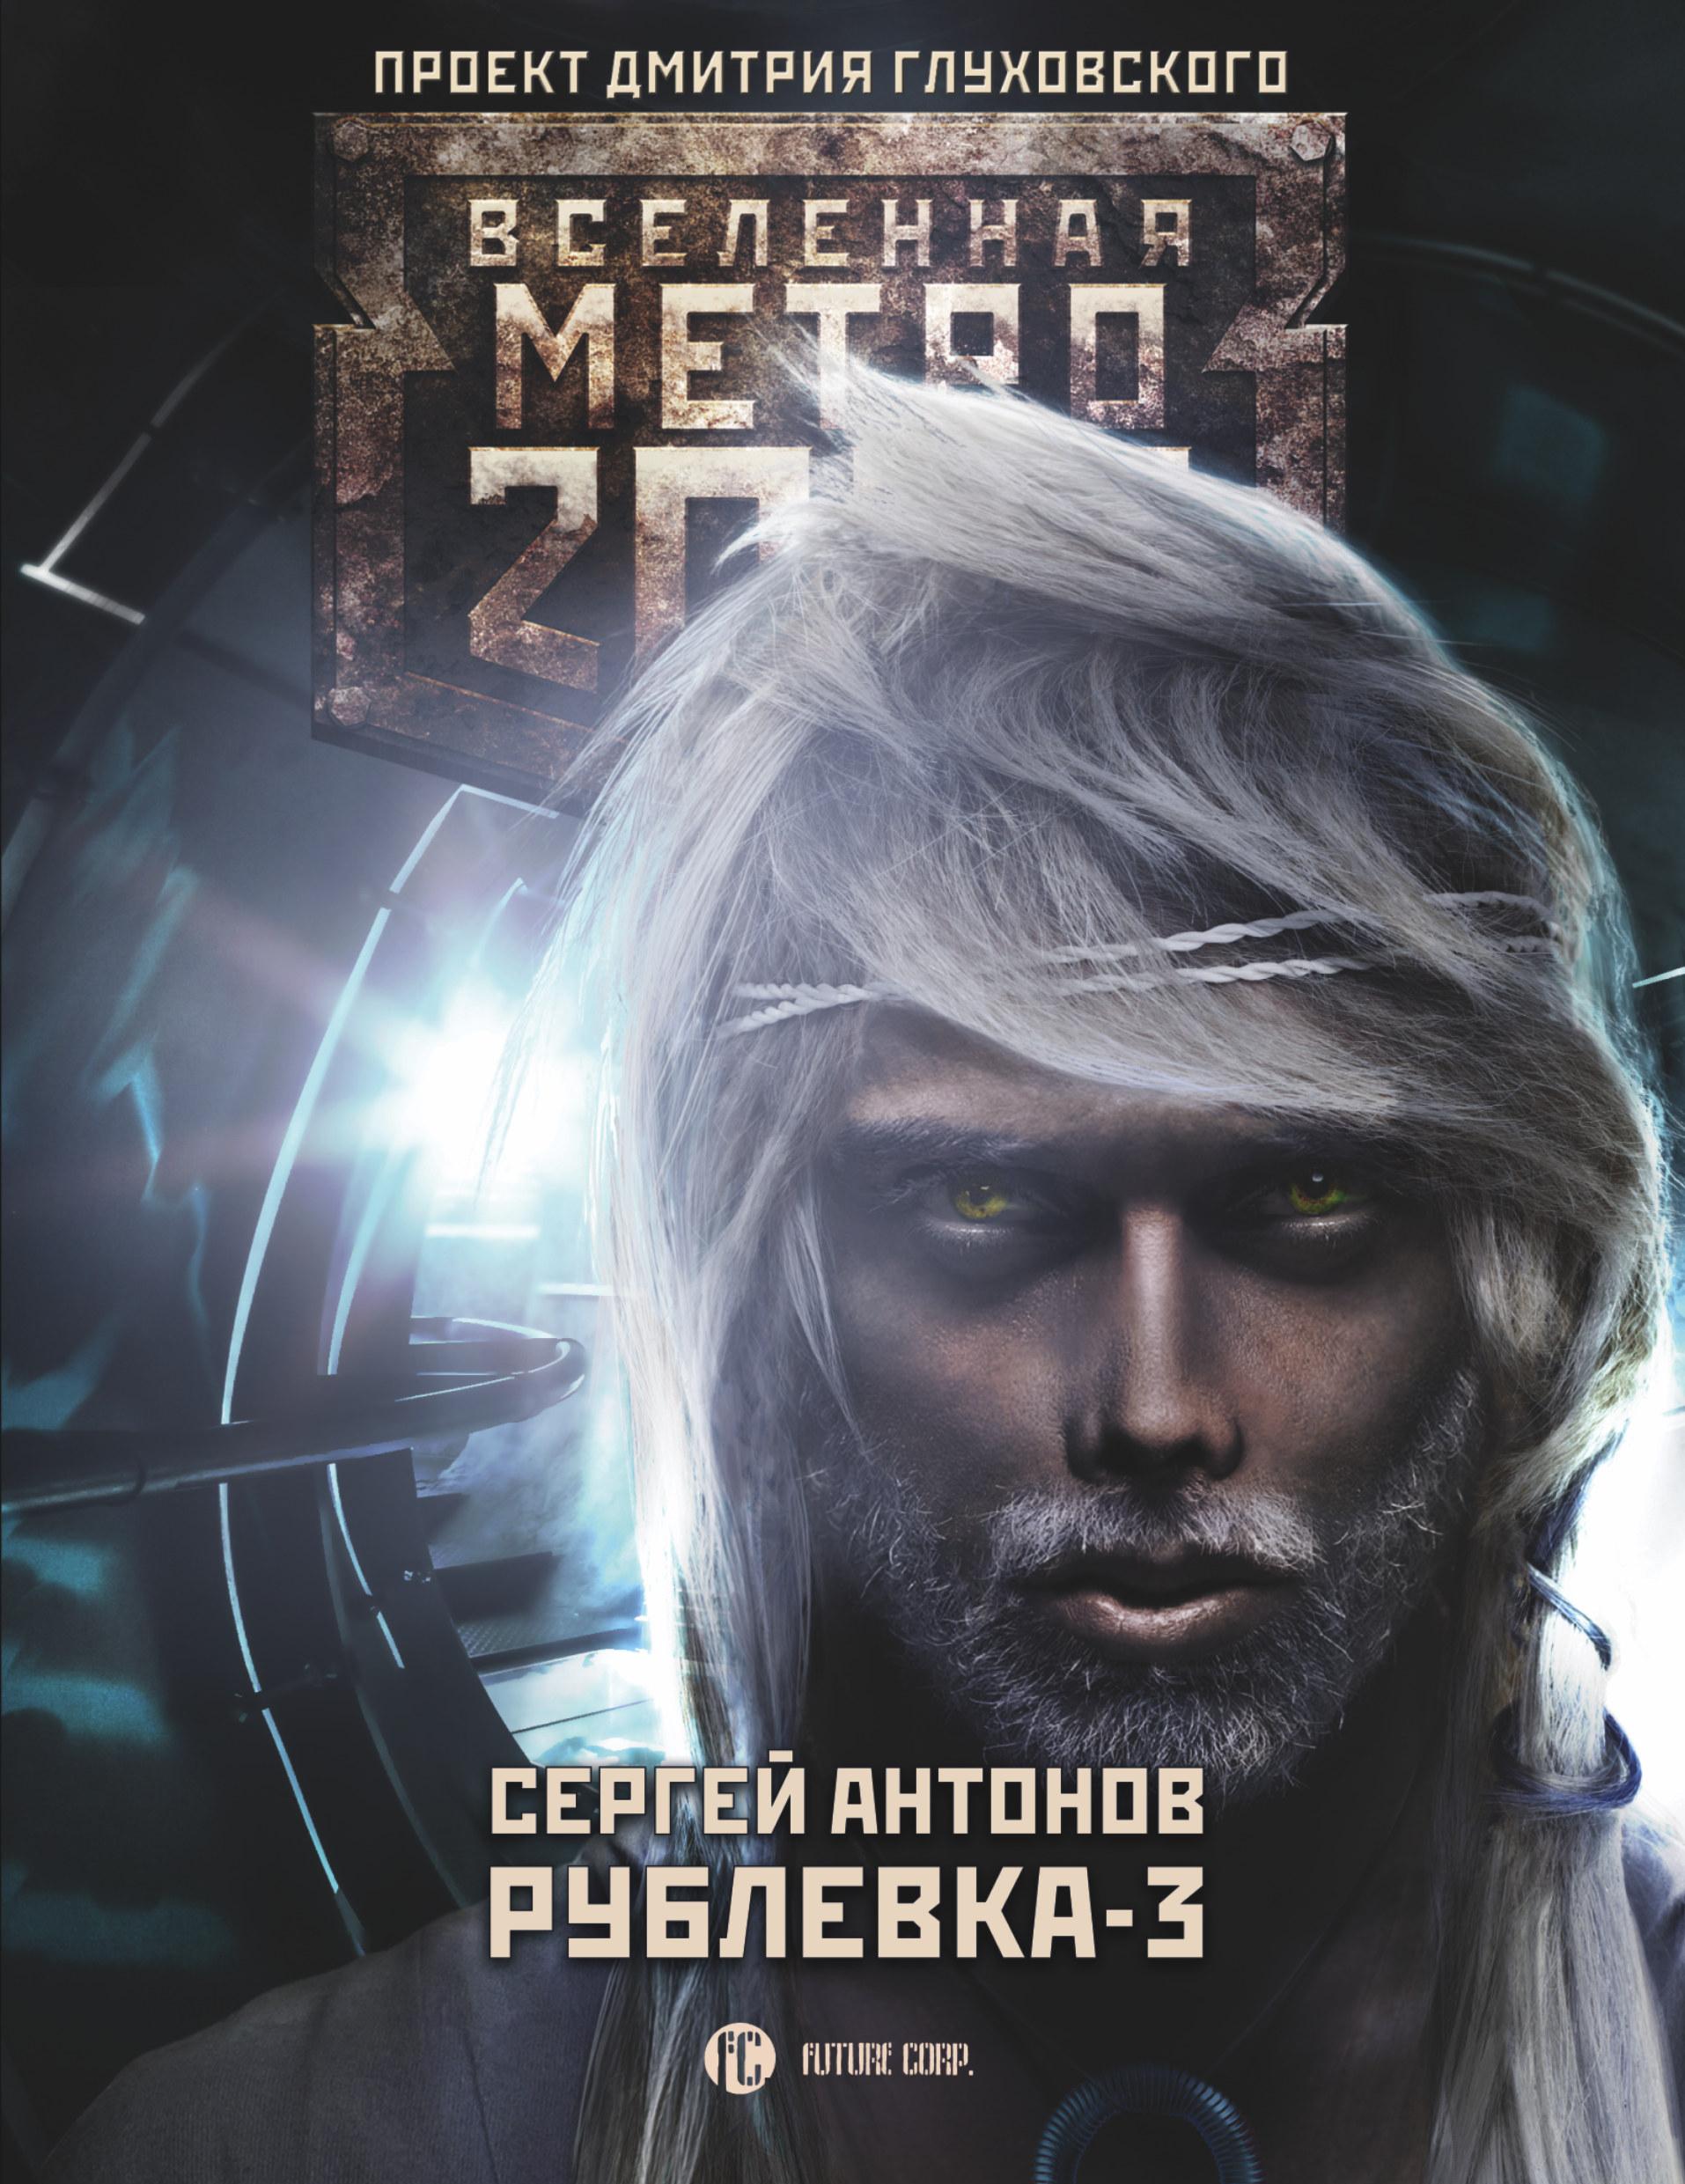 Антонов С.В. Метро 2033: Рублевка-3. Книга мертвых шабалов д метро 2033 право на жизнь